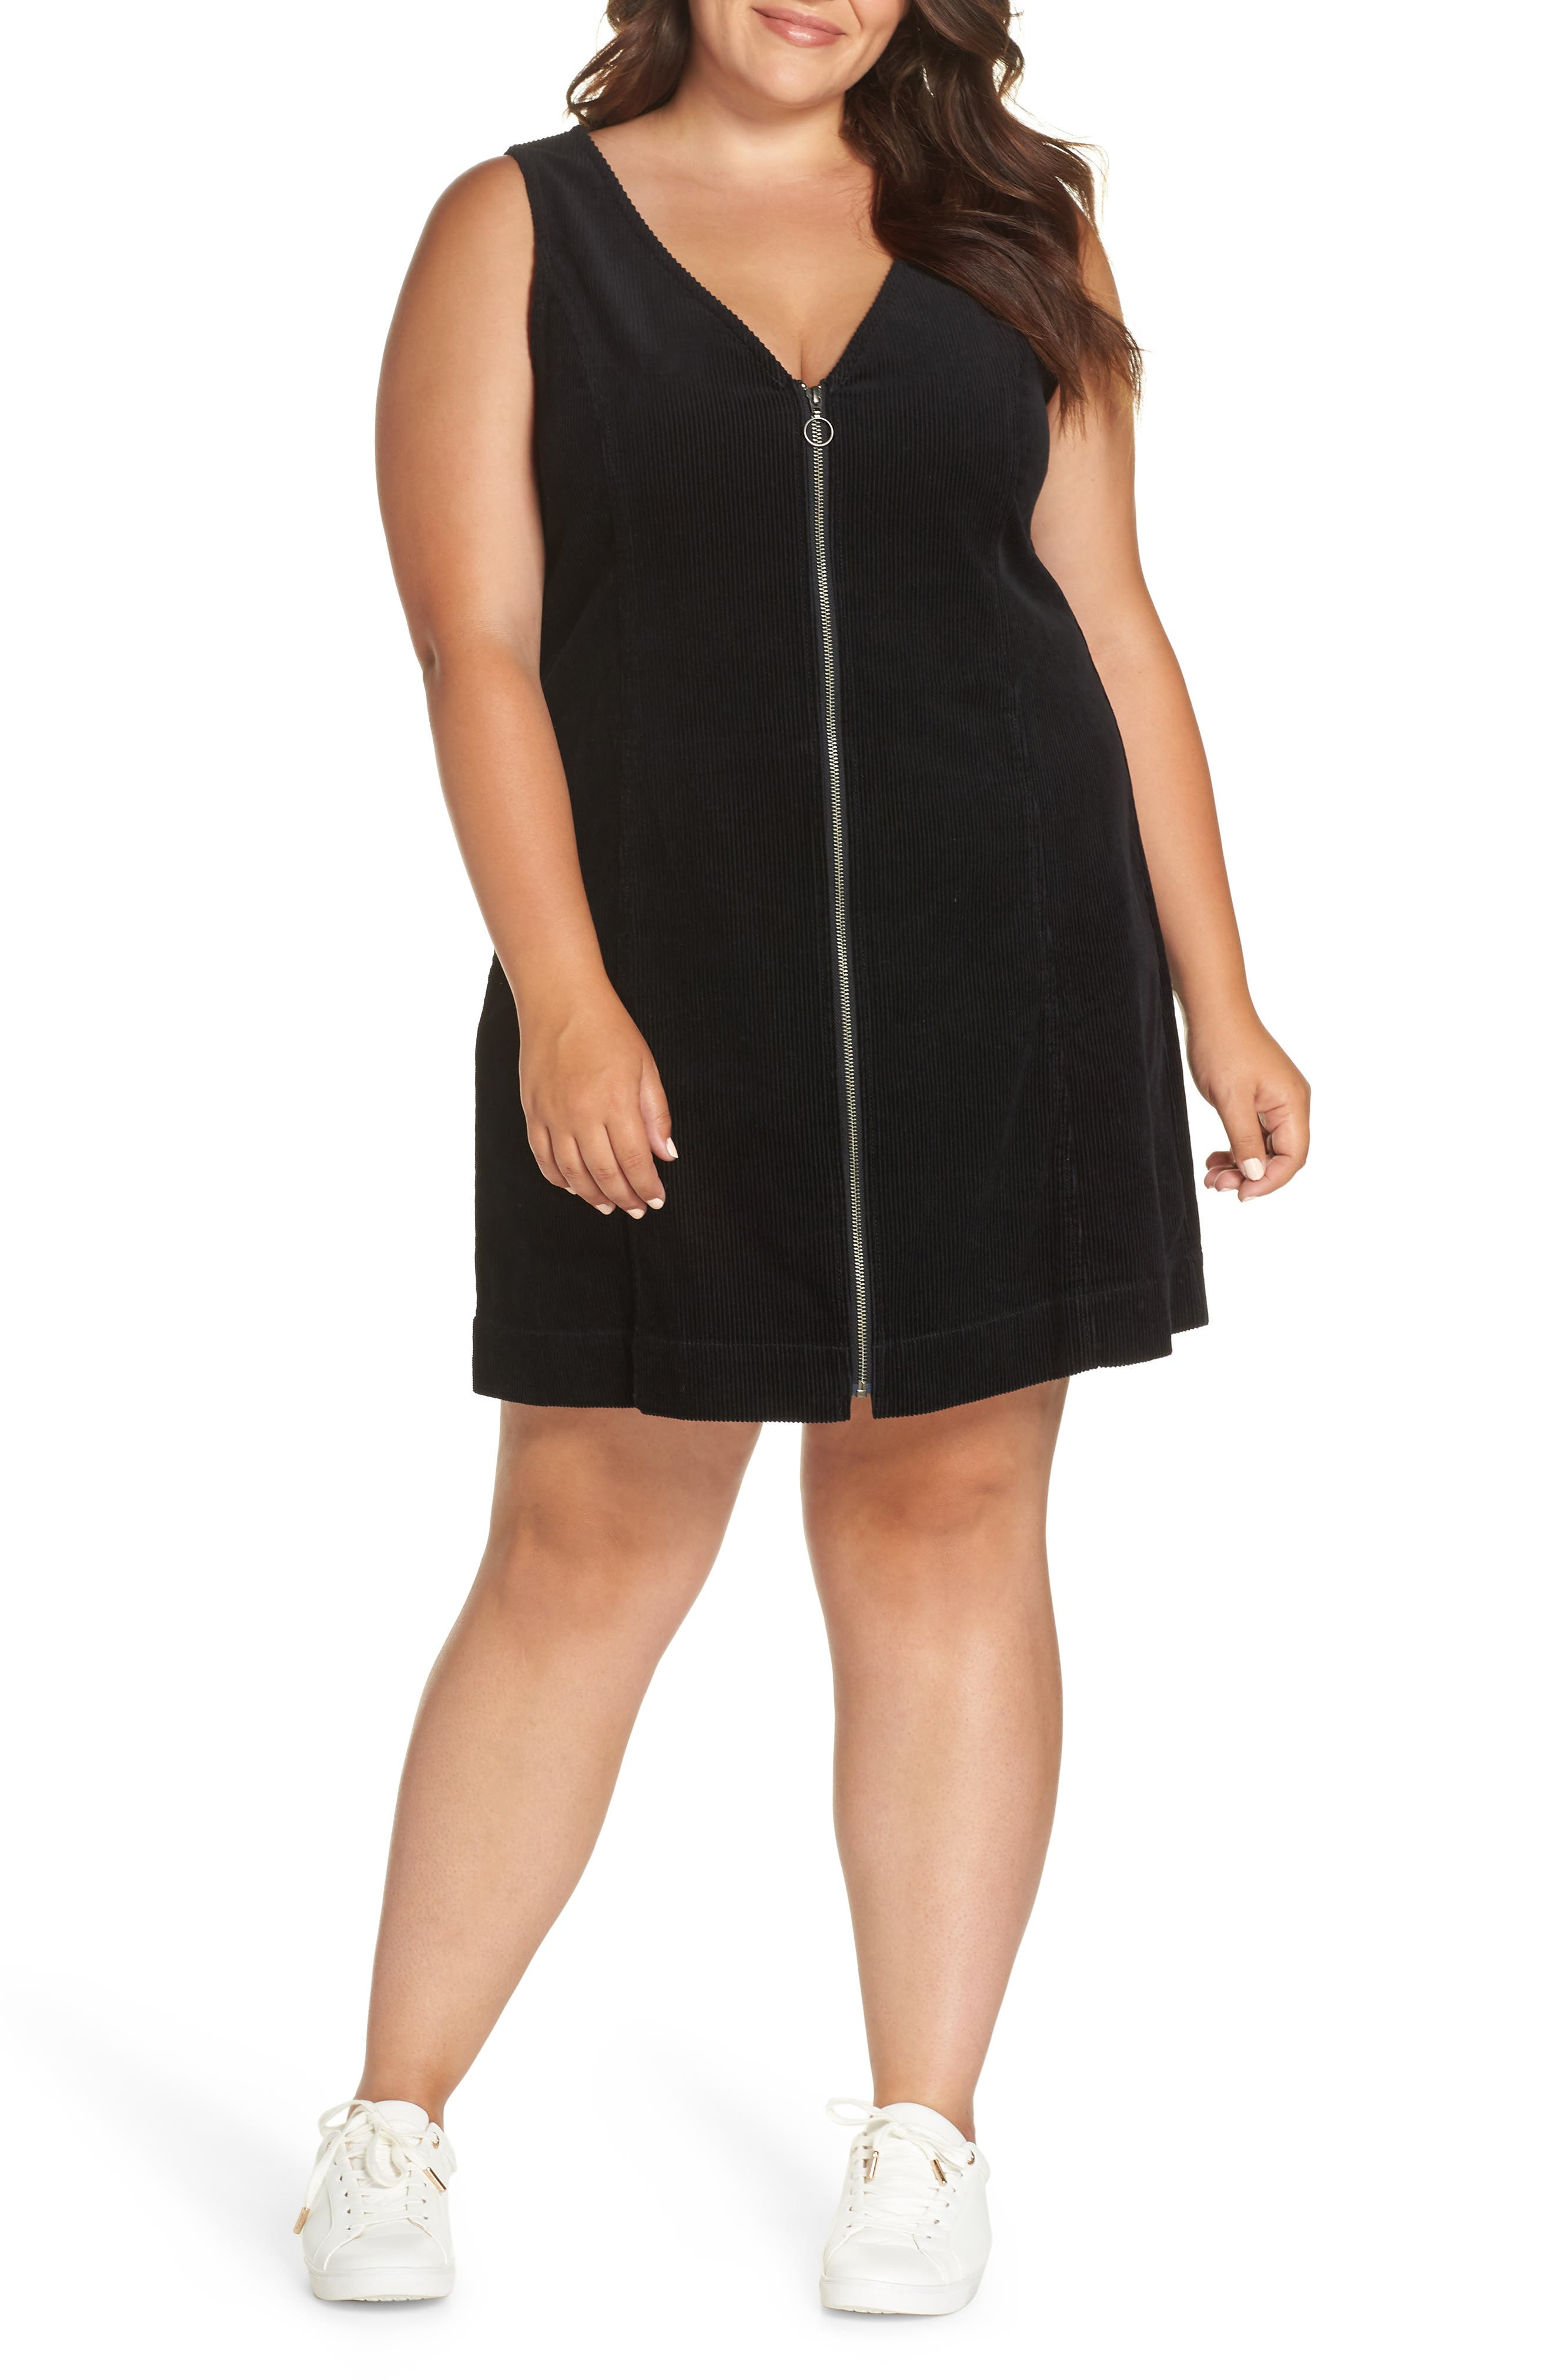 Plus Size Little Black Dress for Women